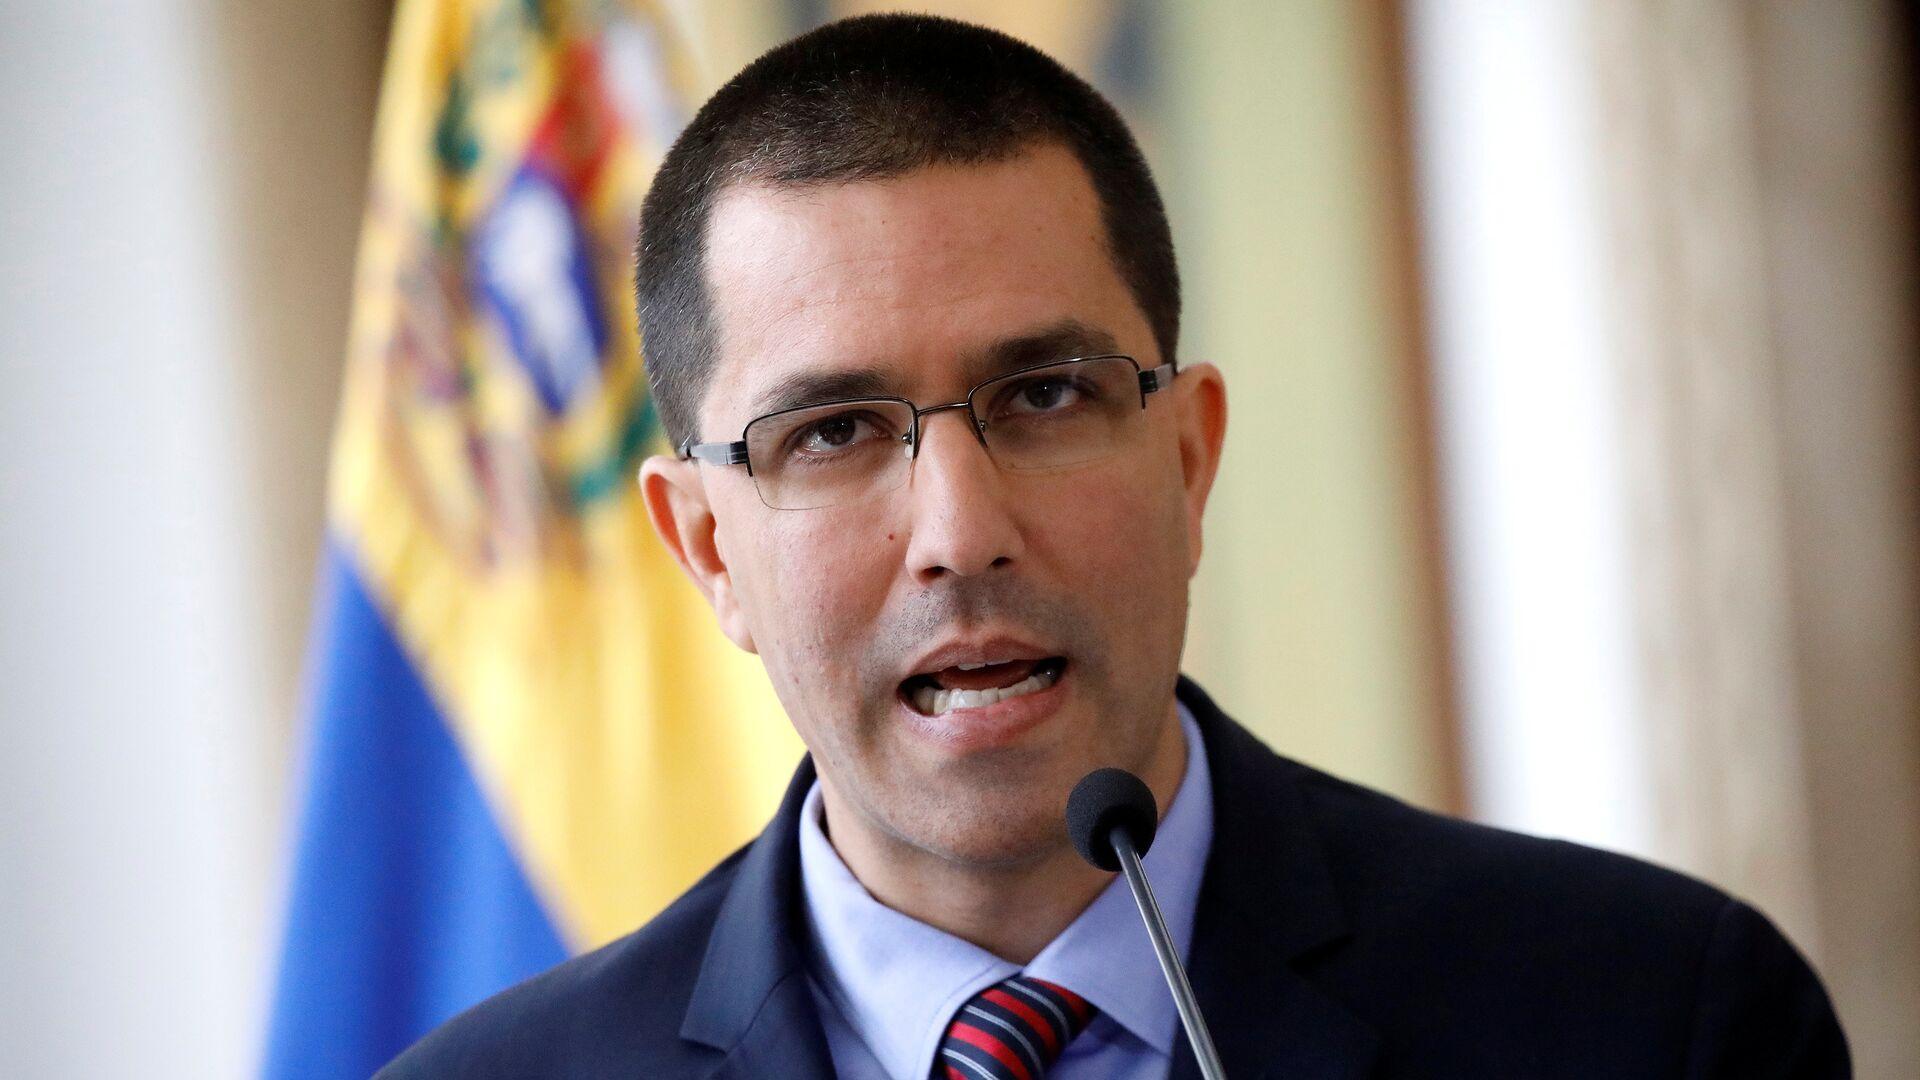 Jorge Arreaza, el canciller de Venezuela - Sputnik Mundo, 1920, 10.08.2021